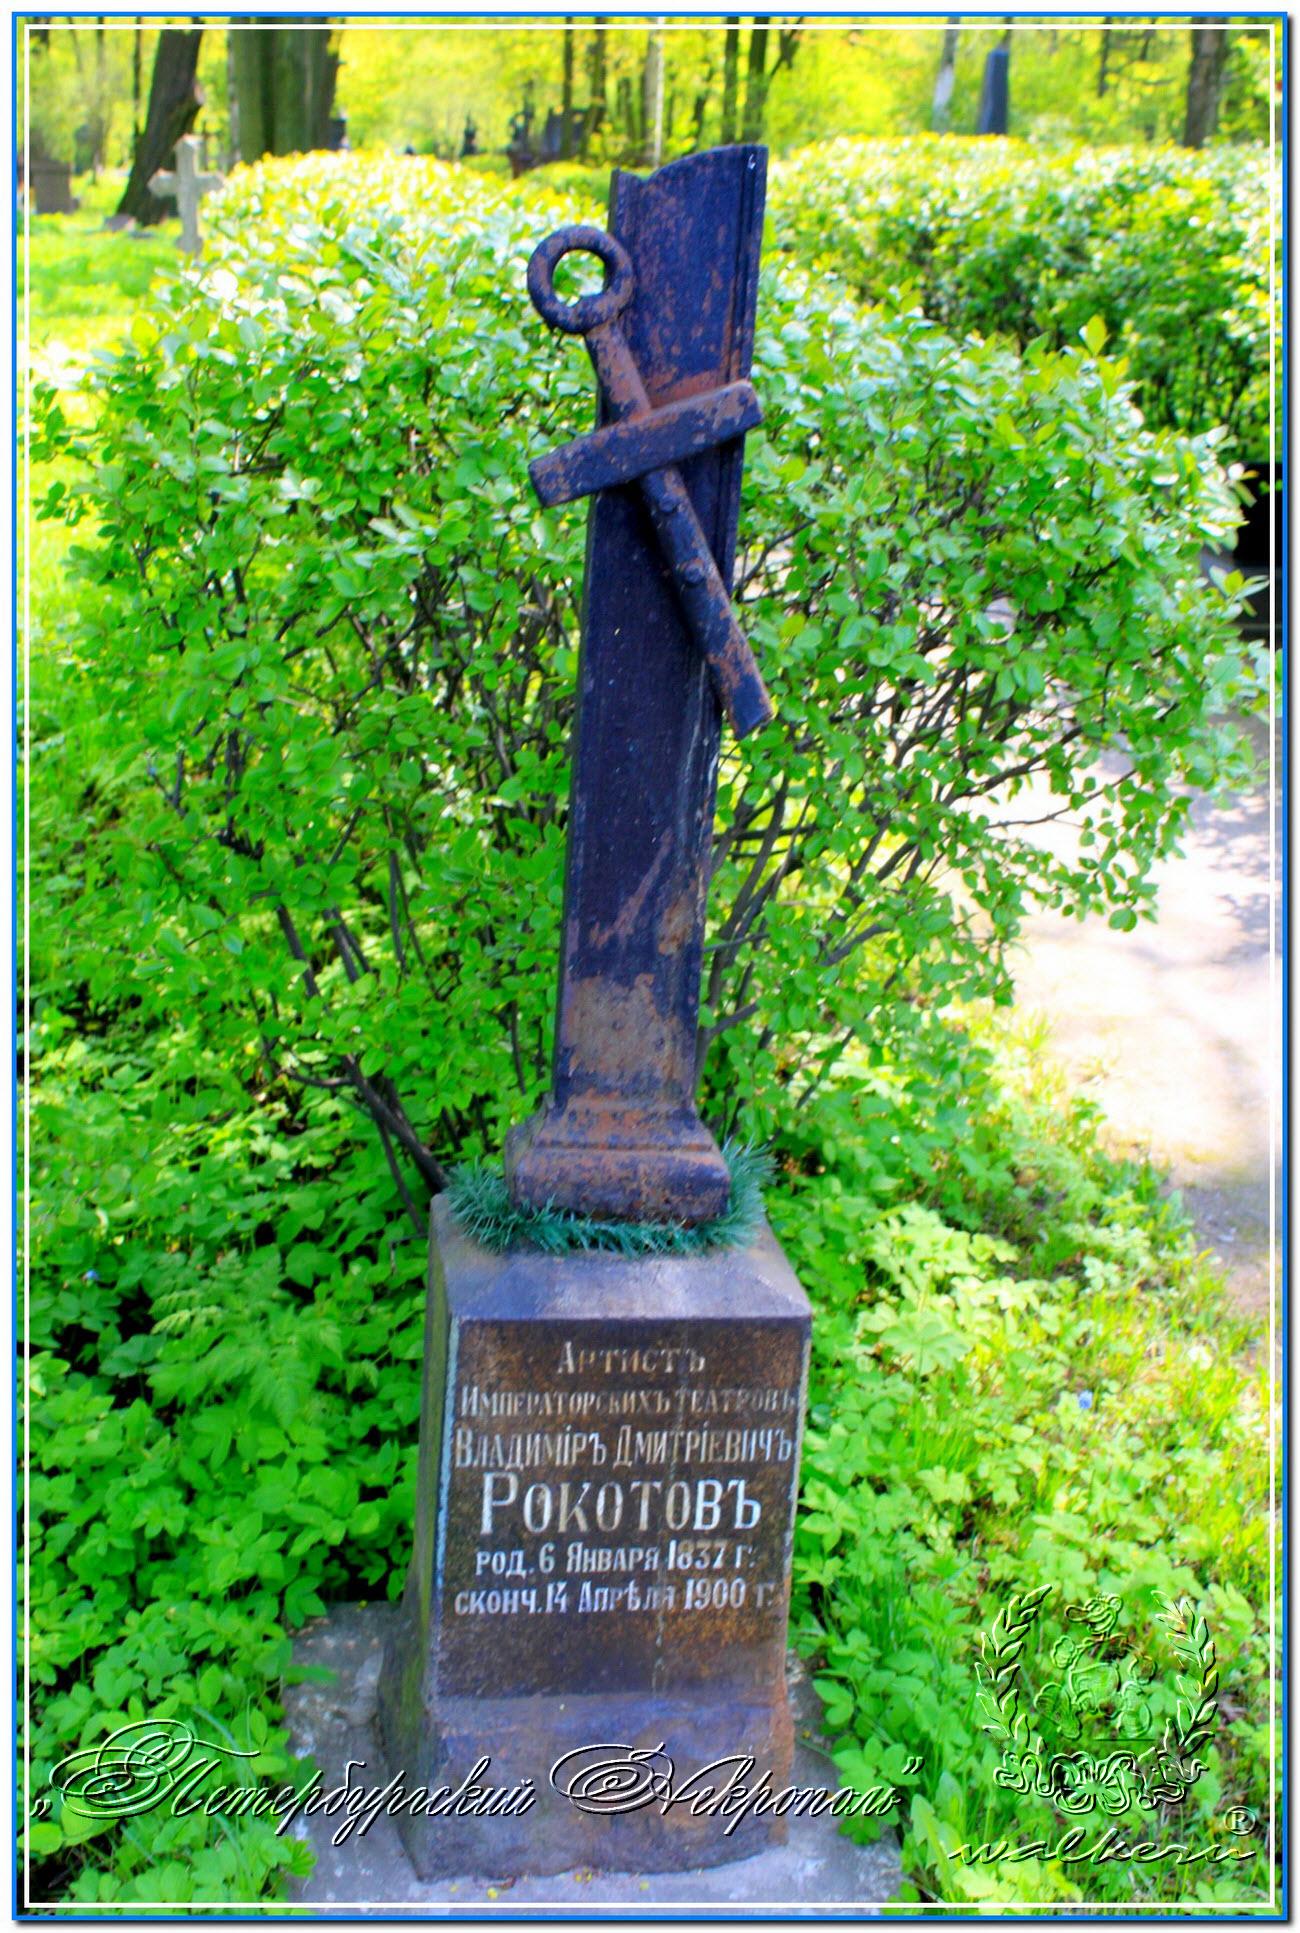 Рокотов Владимир Дмитриевич